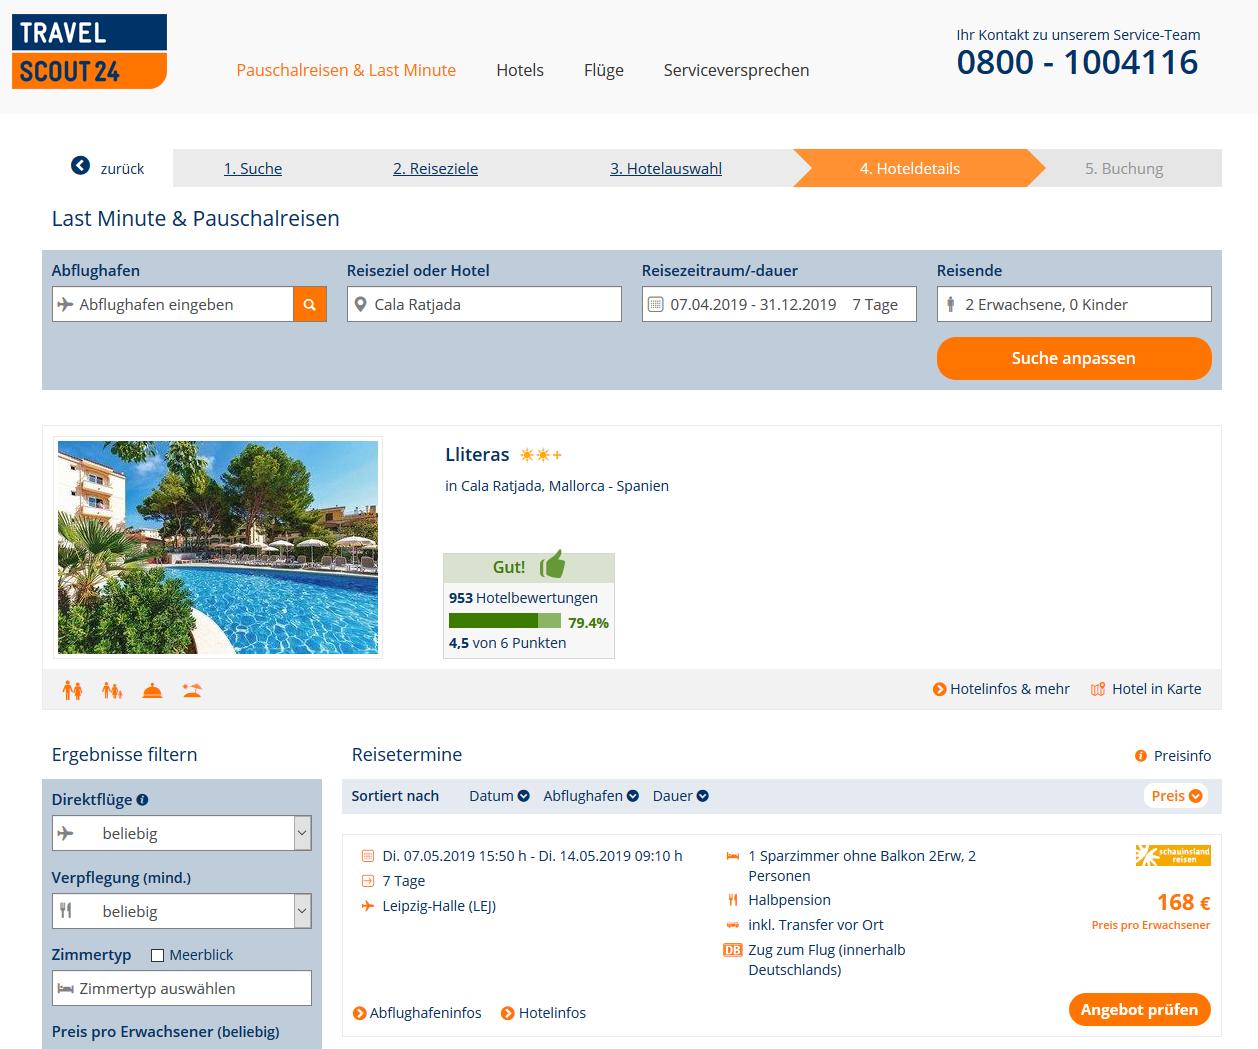 Hotel Und Appartements Lliteras In Cala Ratjada Mallorca Urlaub Im Mai